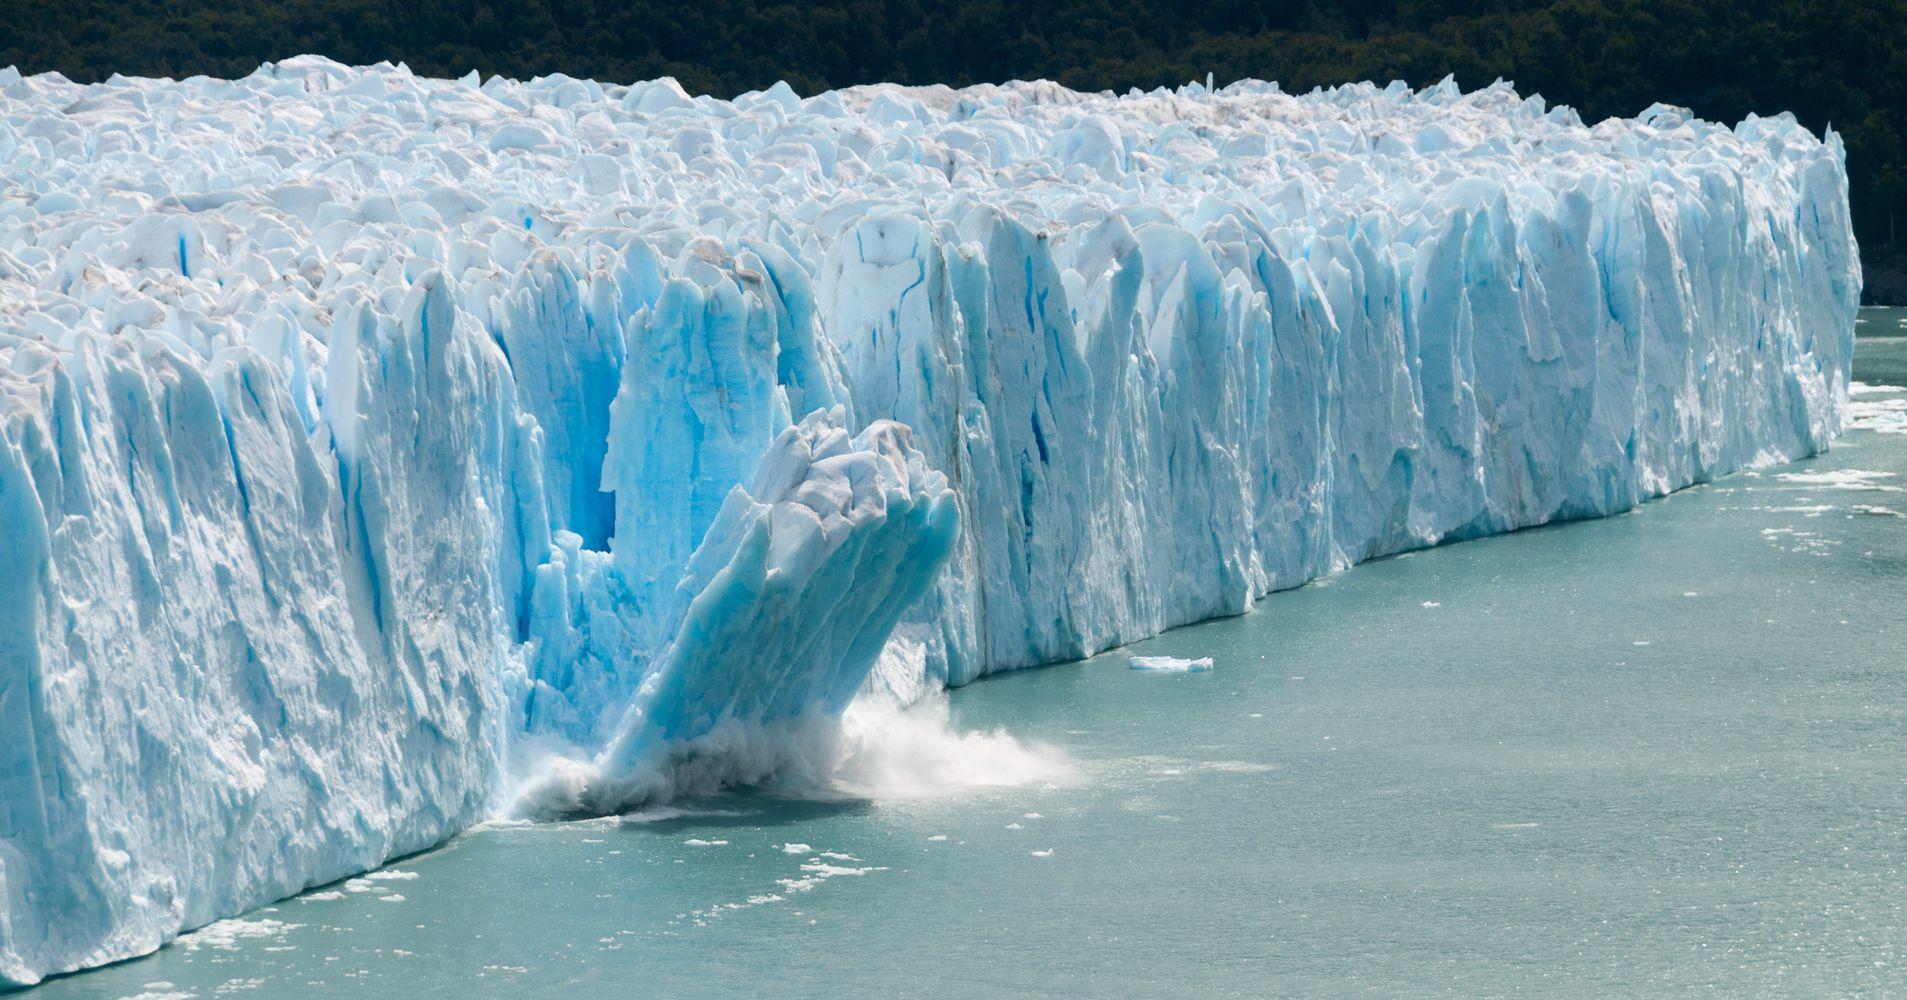 A Dire U.N. Report Warns Of Ruinous Global Warming. Republicans Say It's 'Fantasy.'